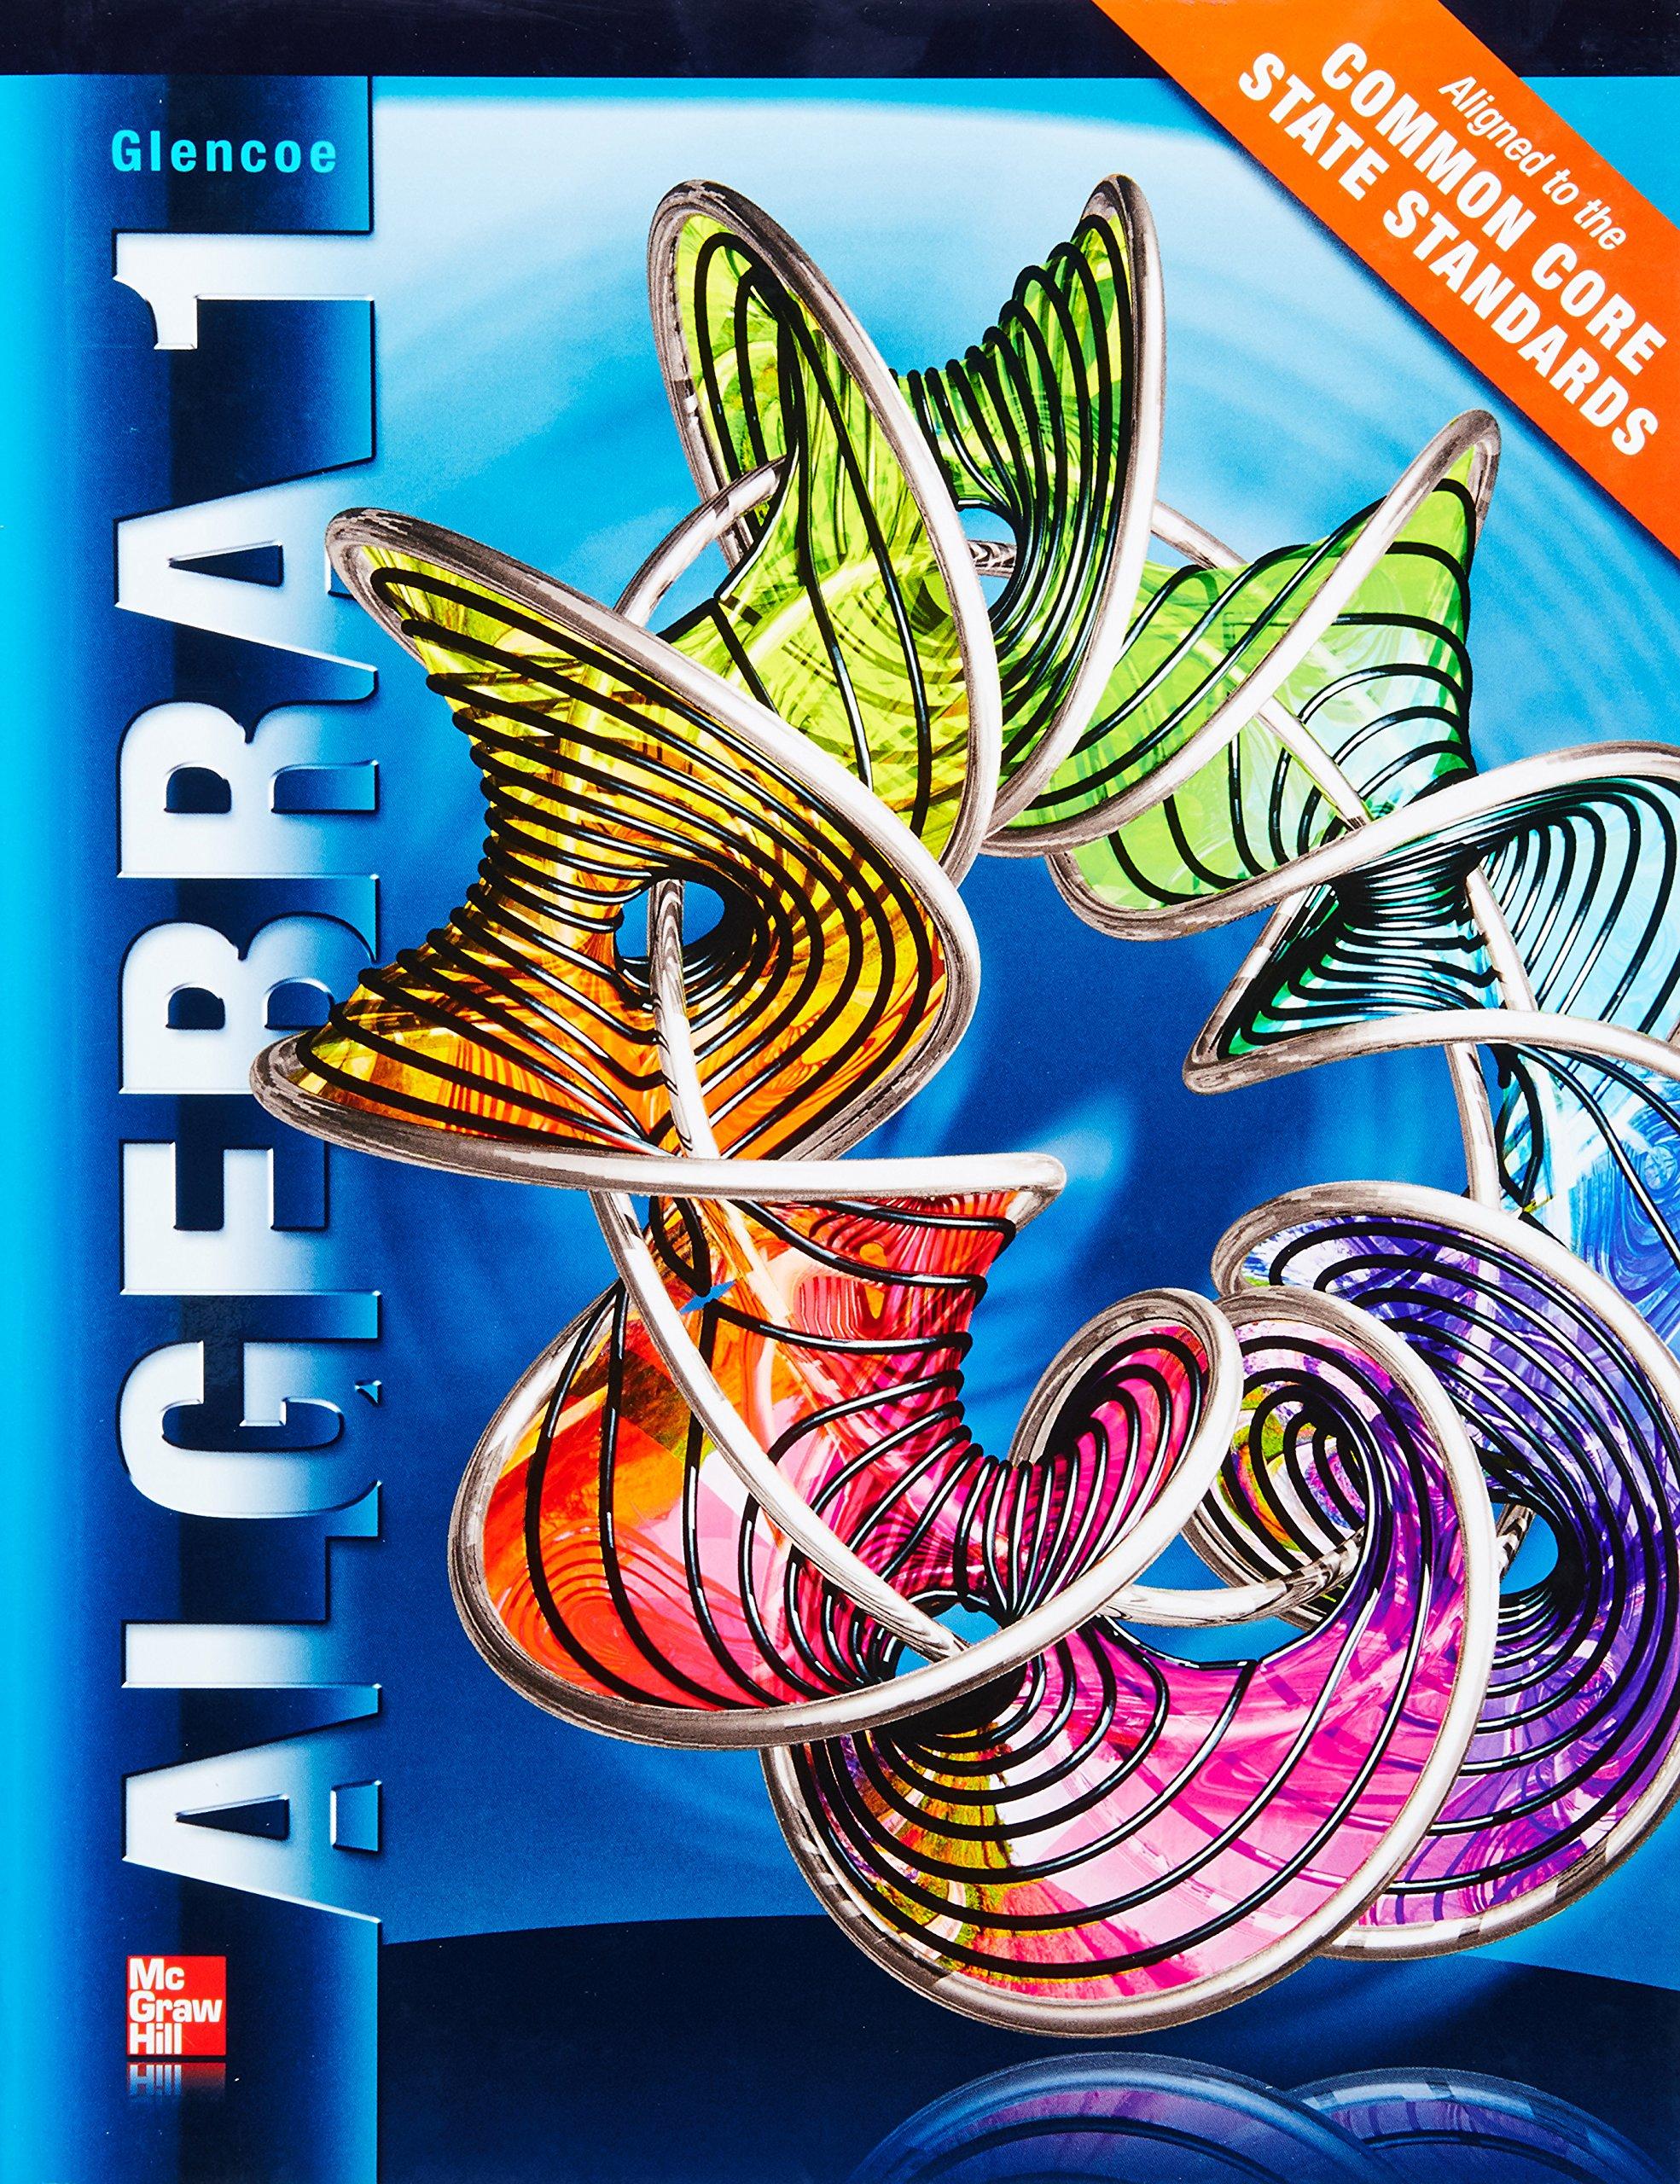 Algebra 1, Student Edition (MERRILL ALGEBRA 1) by Brand: Glencoe/McGraw-Hill